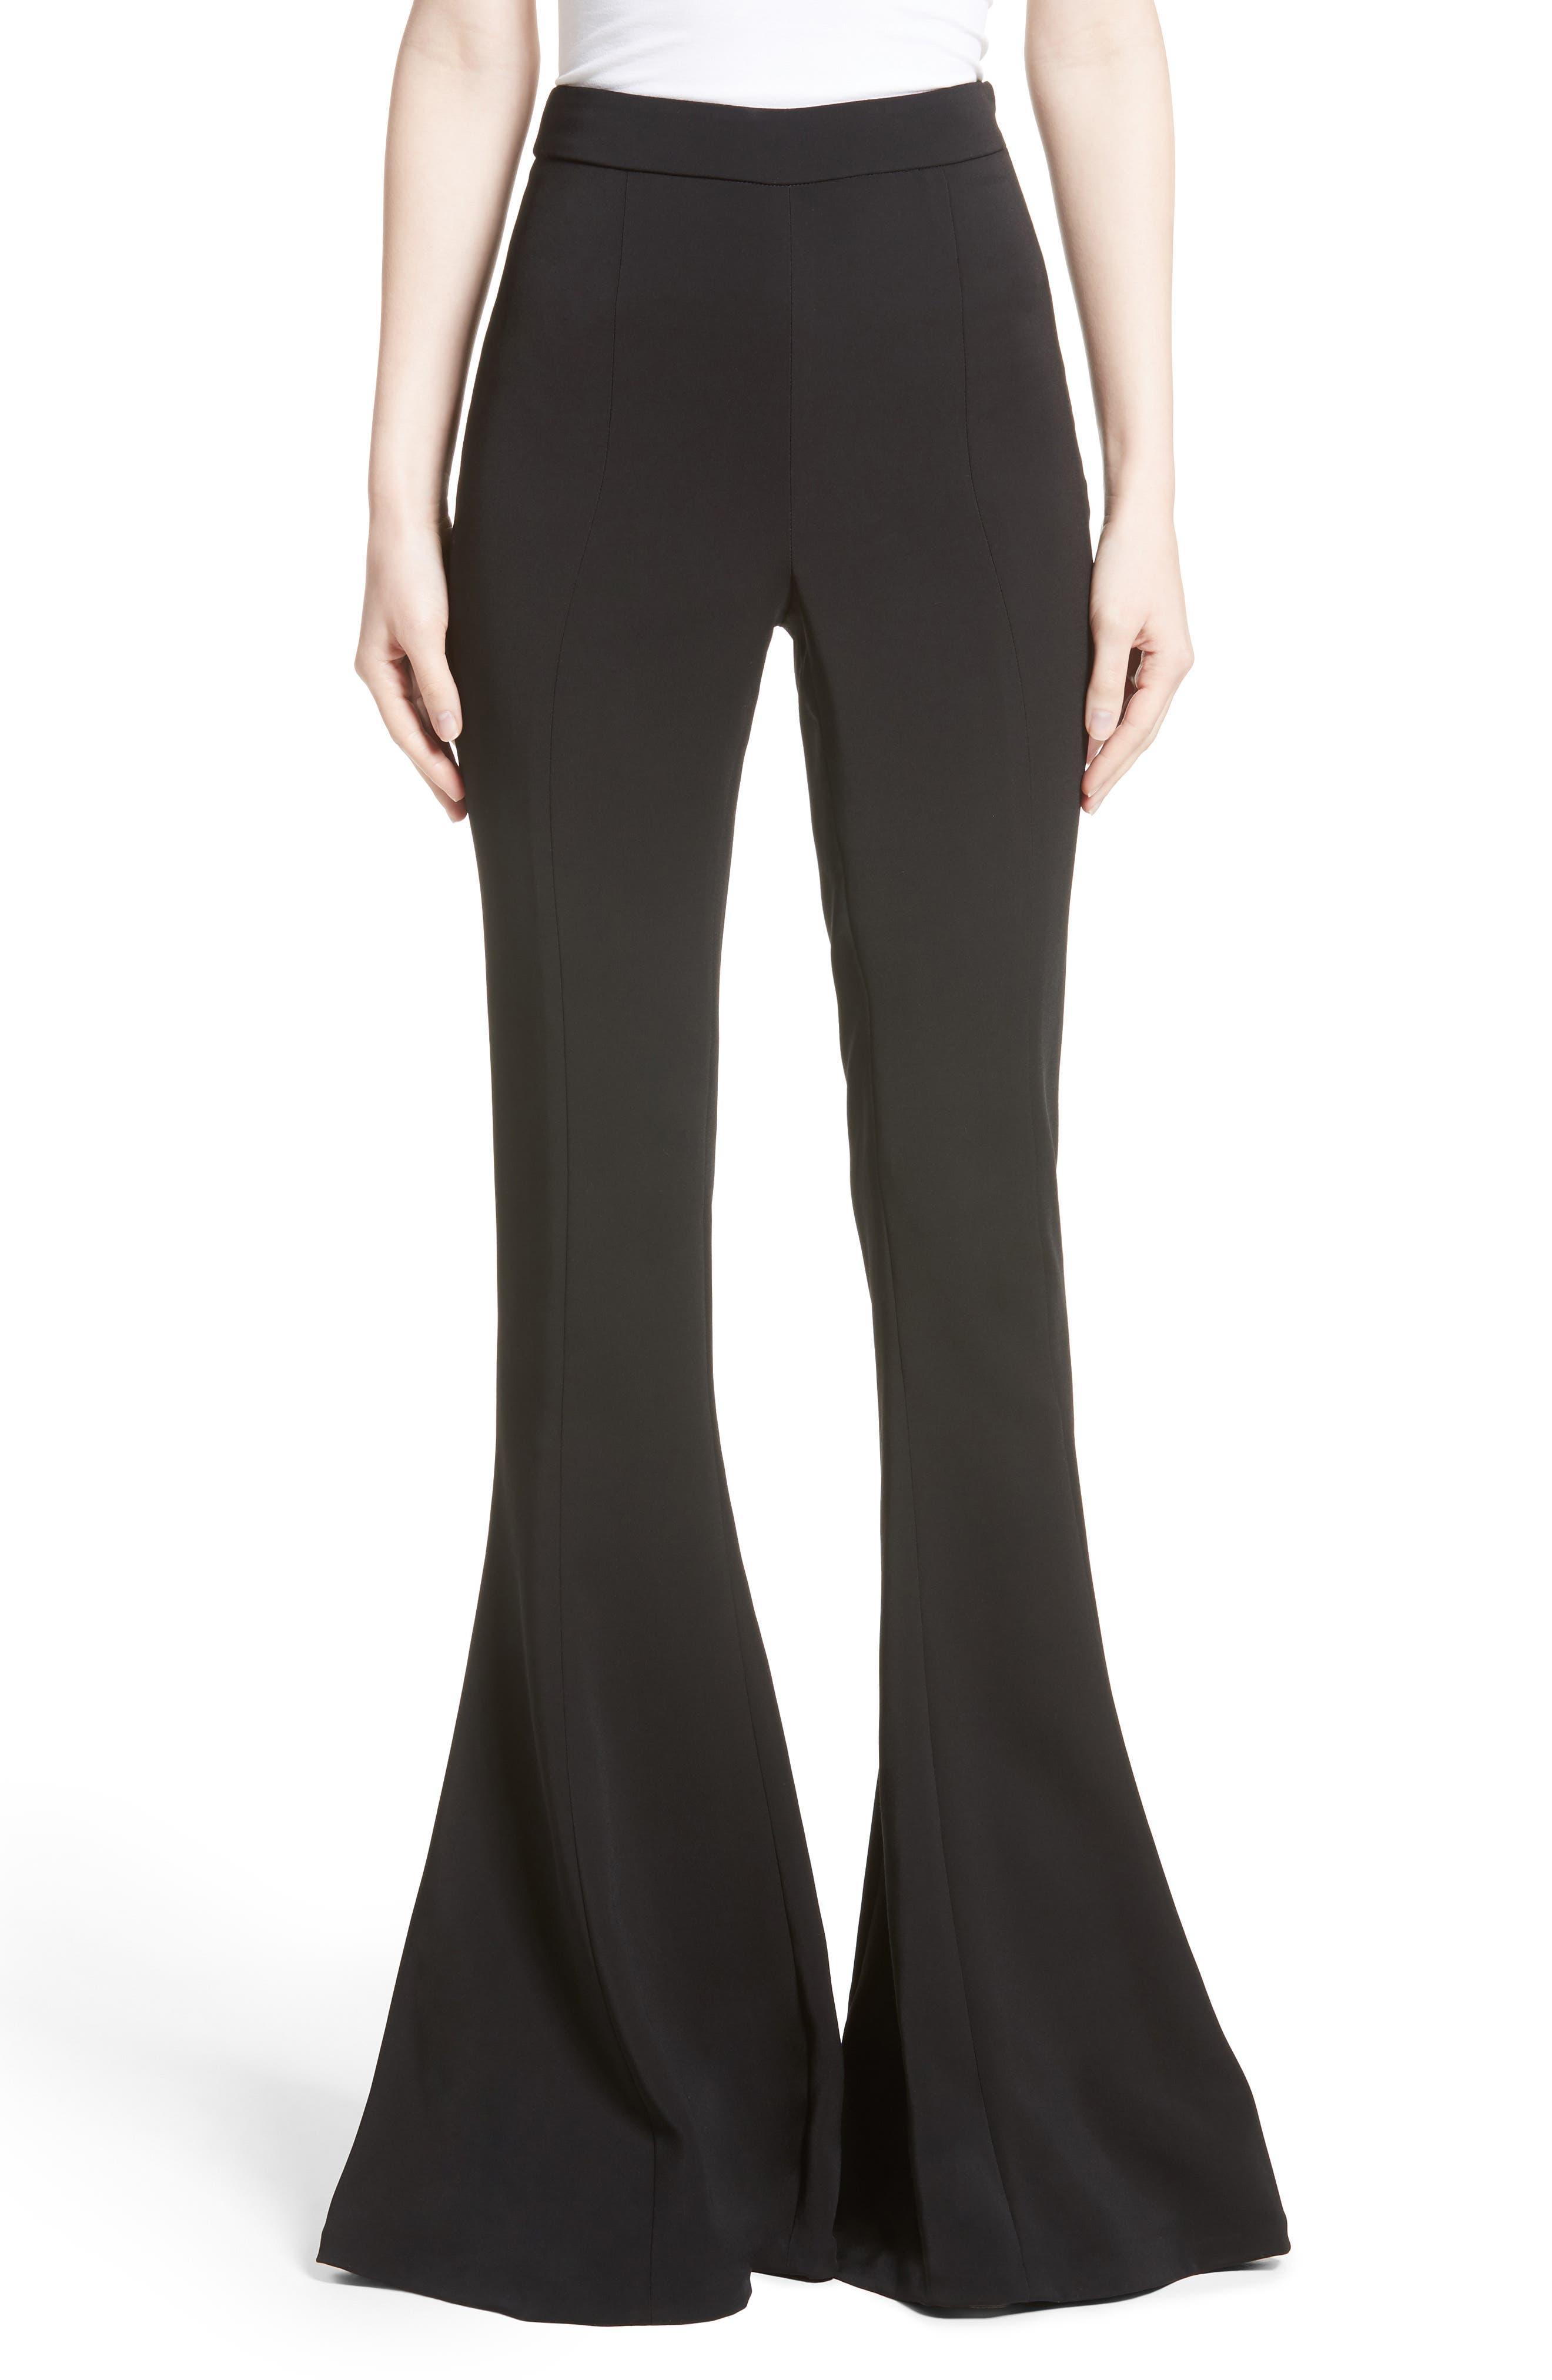 Alternate Image 1 Selected - Cushnie et Ochs Naomi High Waist Flare Pants